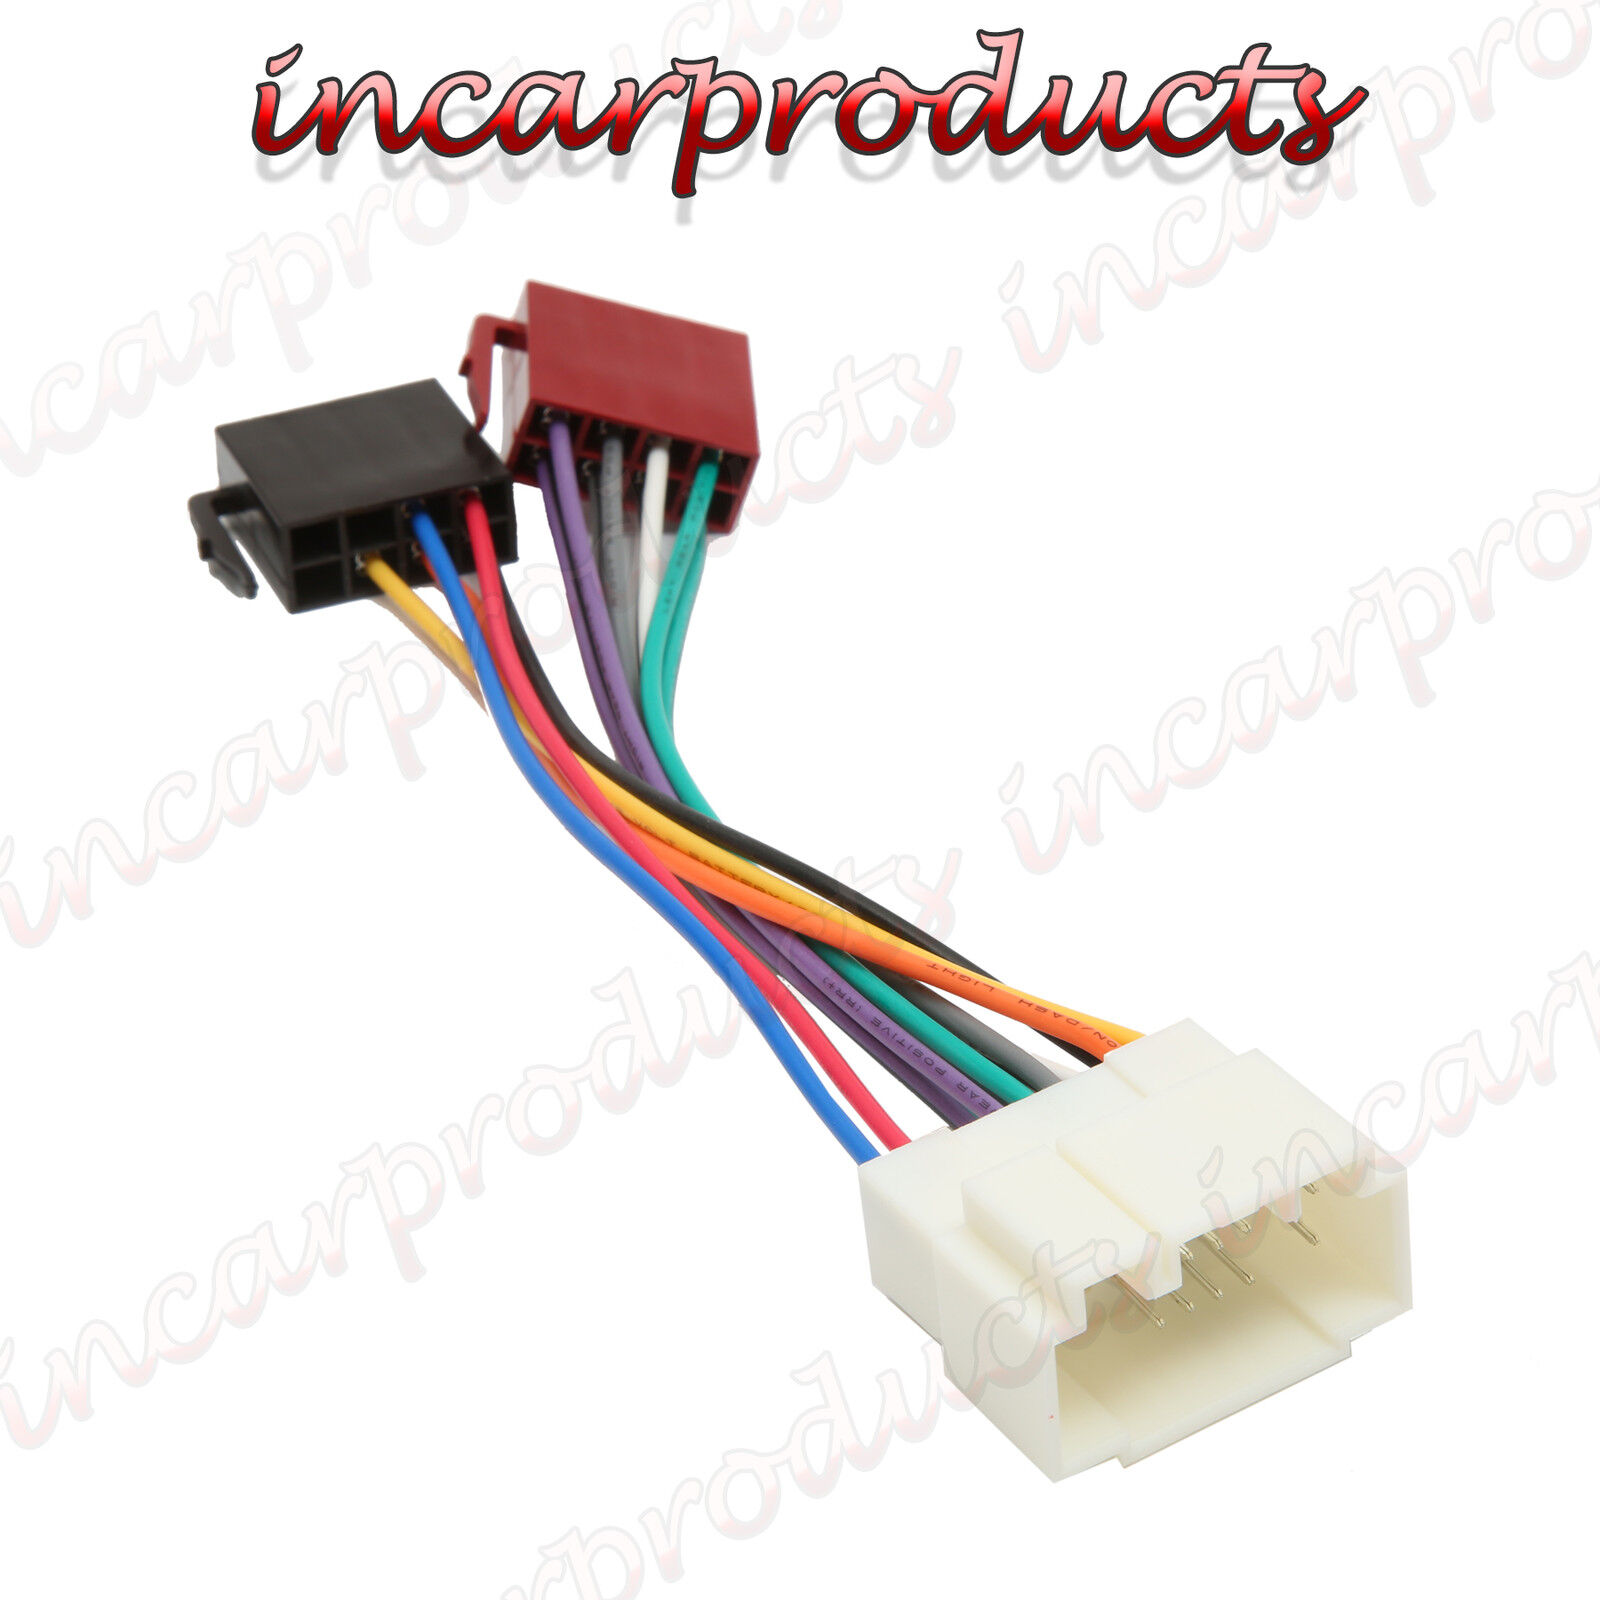 honda civic car stereo radio iso wiring harness adaptor loom hd honda civic car stereo radio iso wiring harness adaptor loom hd 102